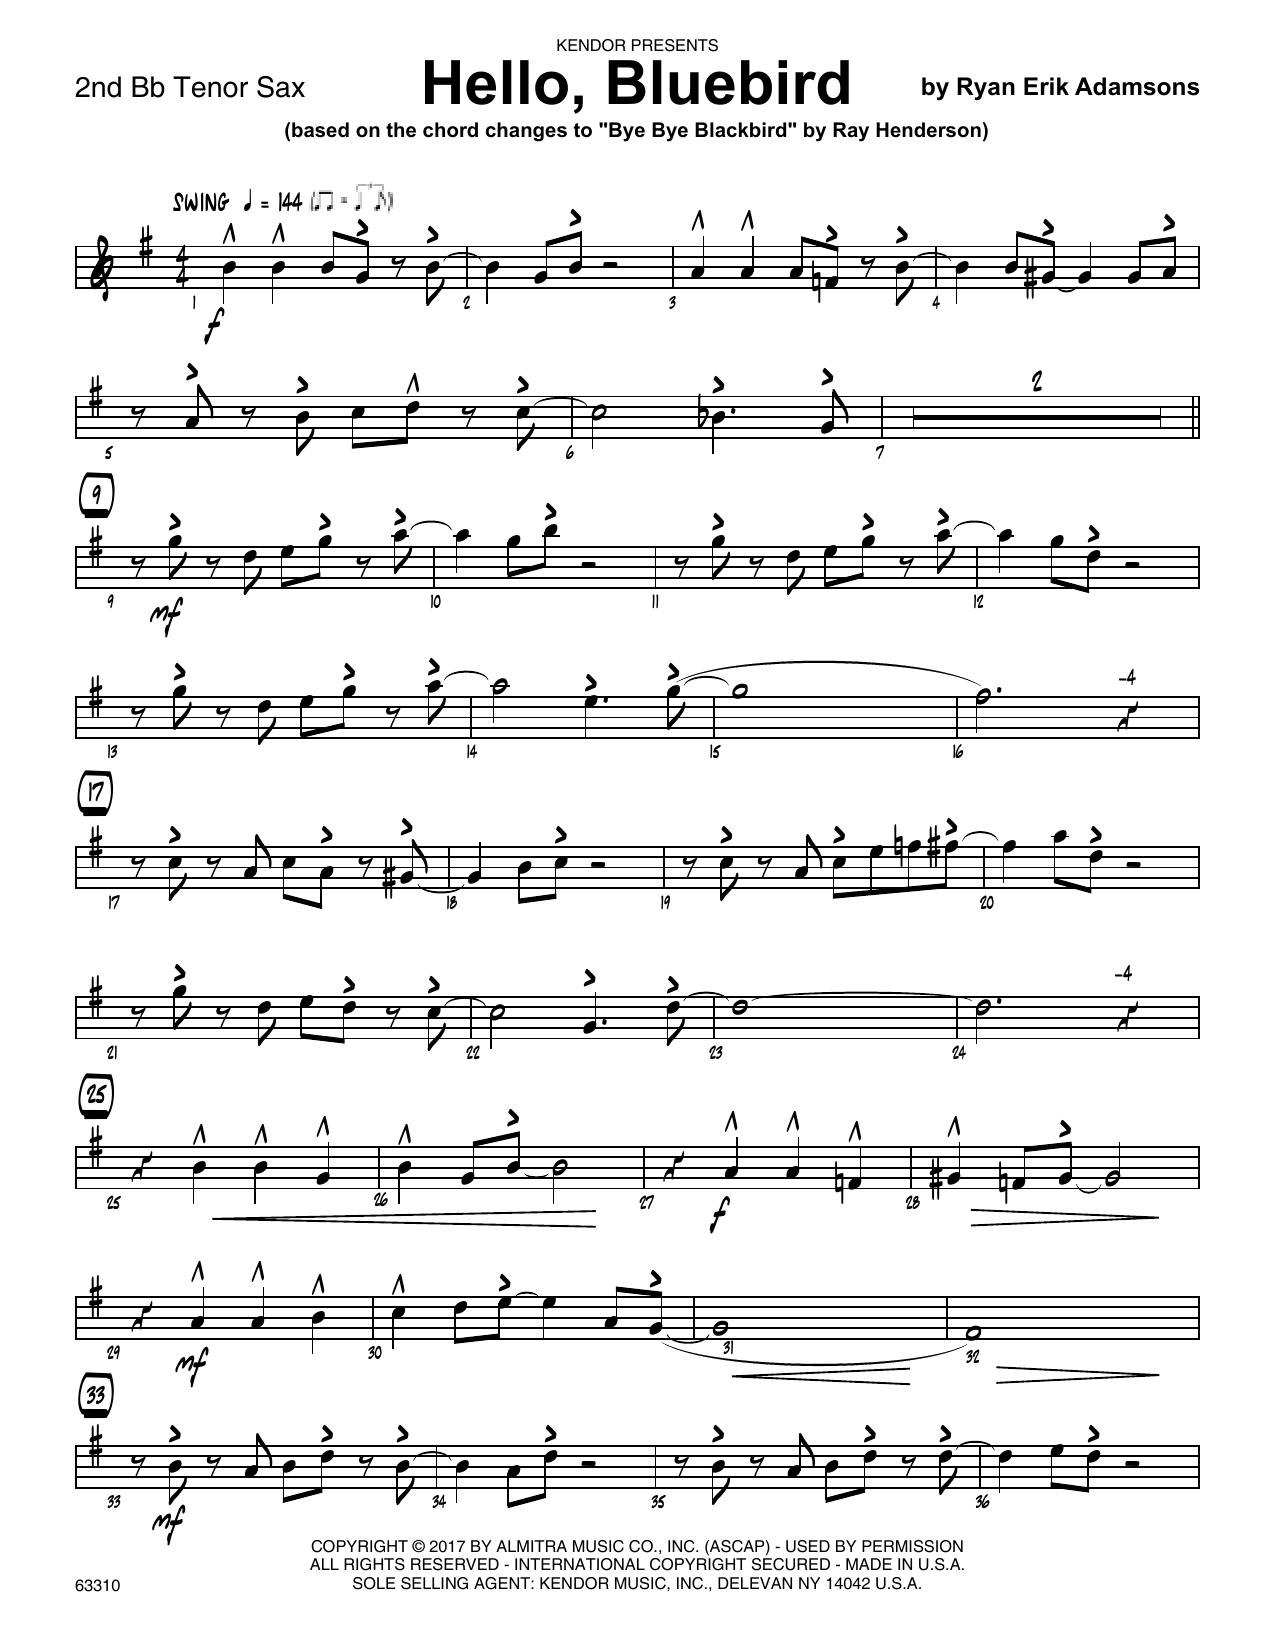 Ryan Erik Adamsons Hello, Bluebird (based on Bye Bye Blackbird) - 2nd Bb Tenor Saxophone sheet music notes printable PDF score